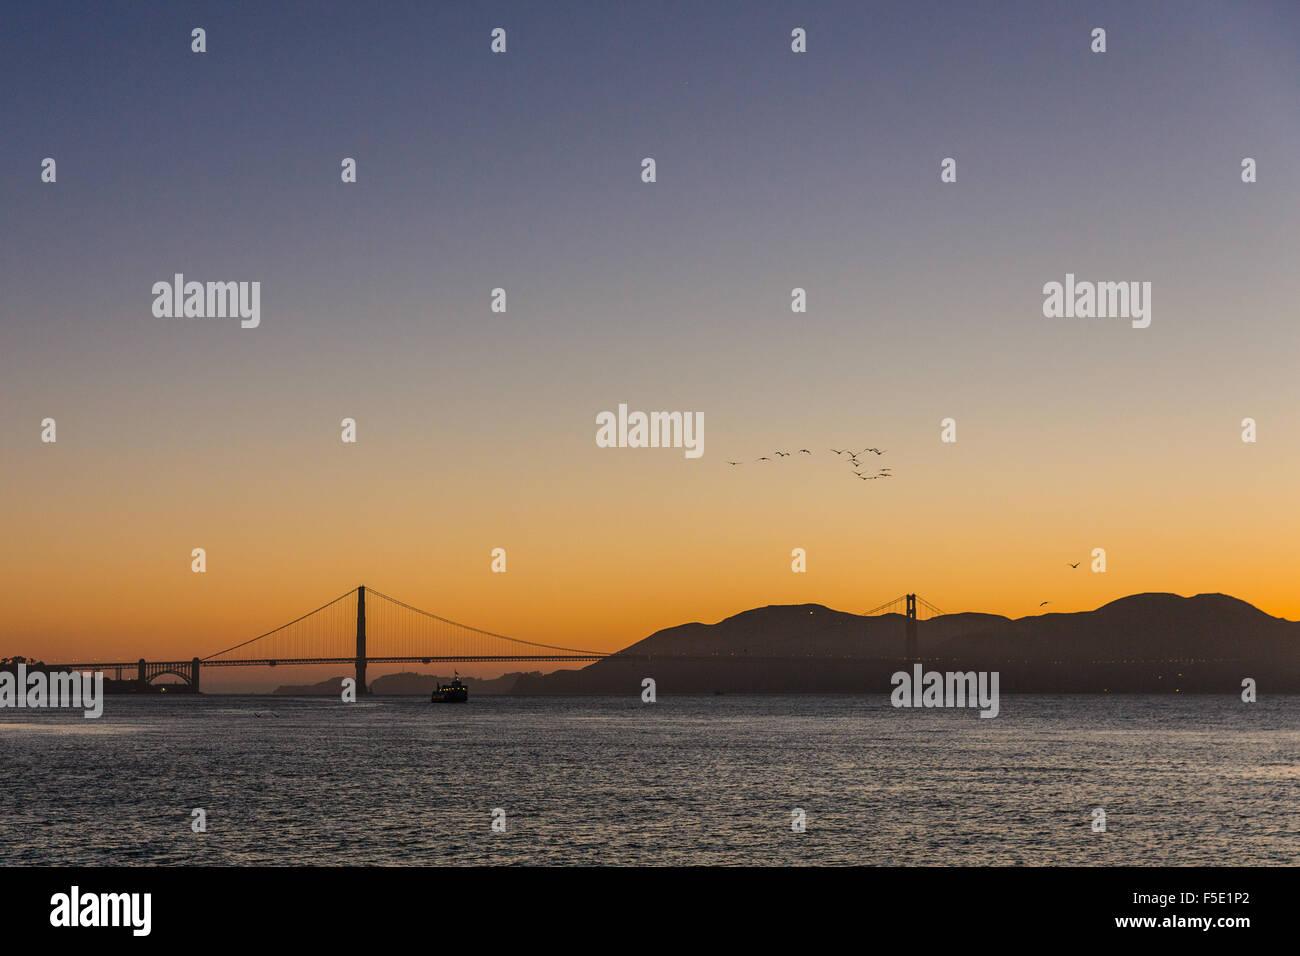 Sunset at Golden Gate Bridge - Stock Image